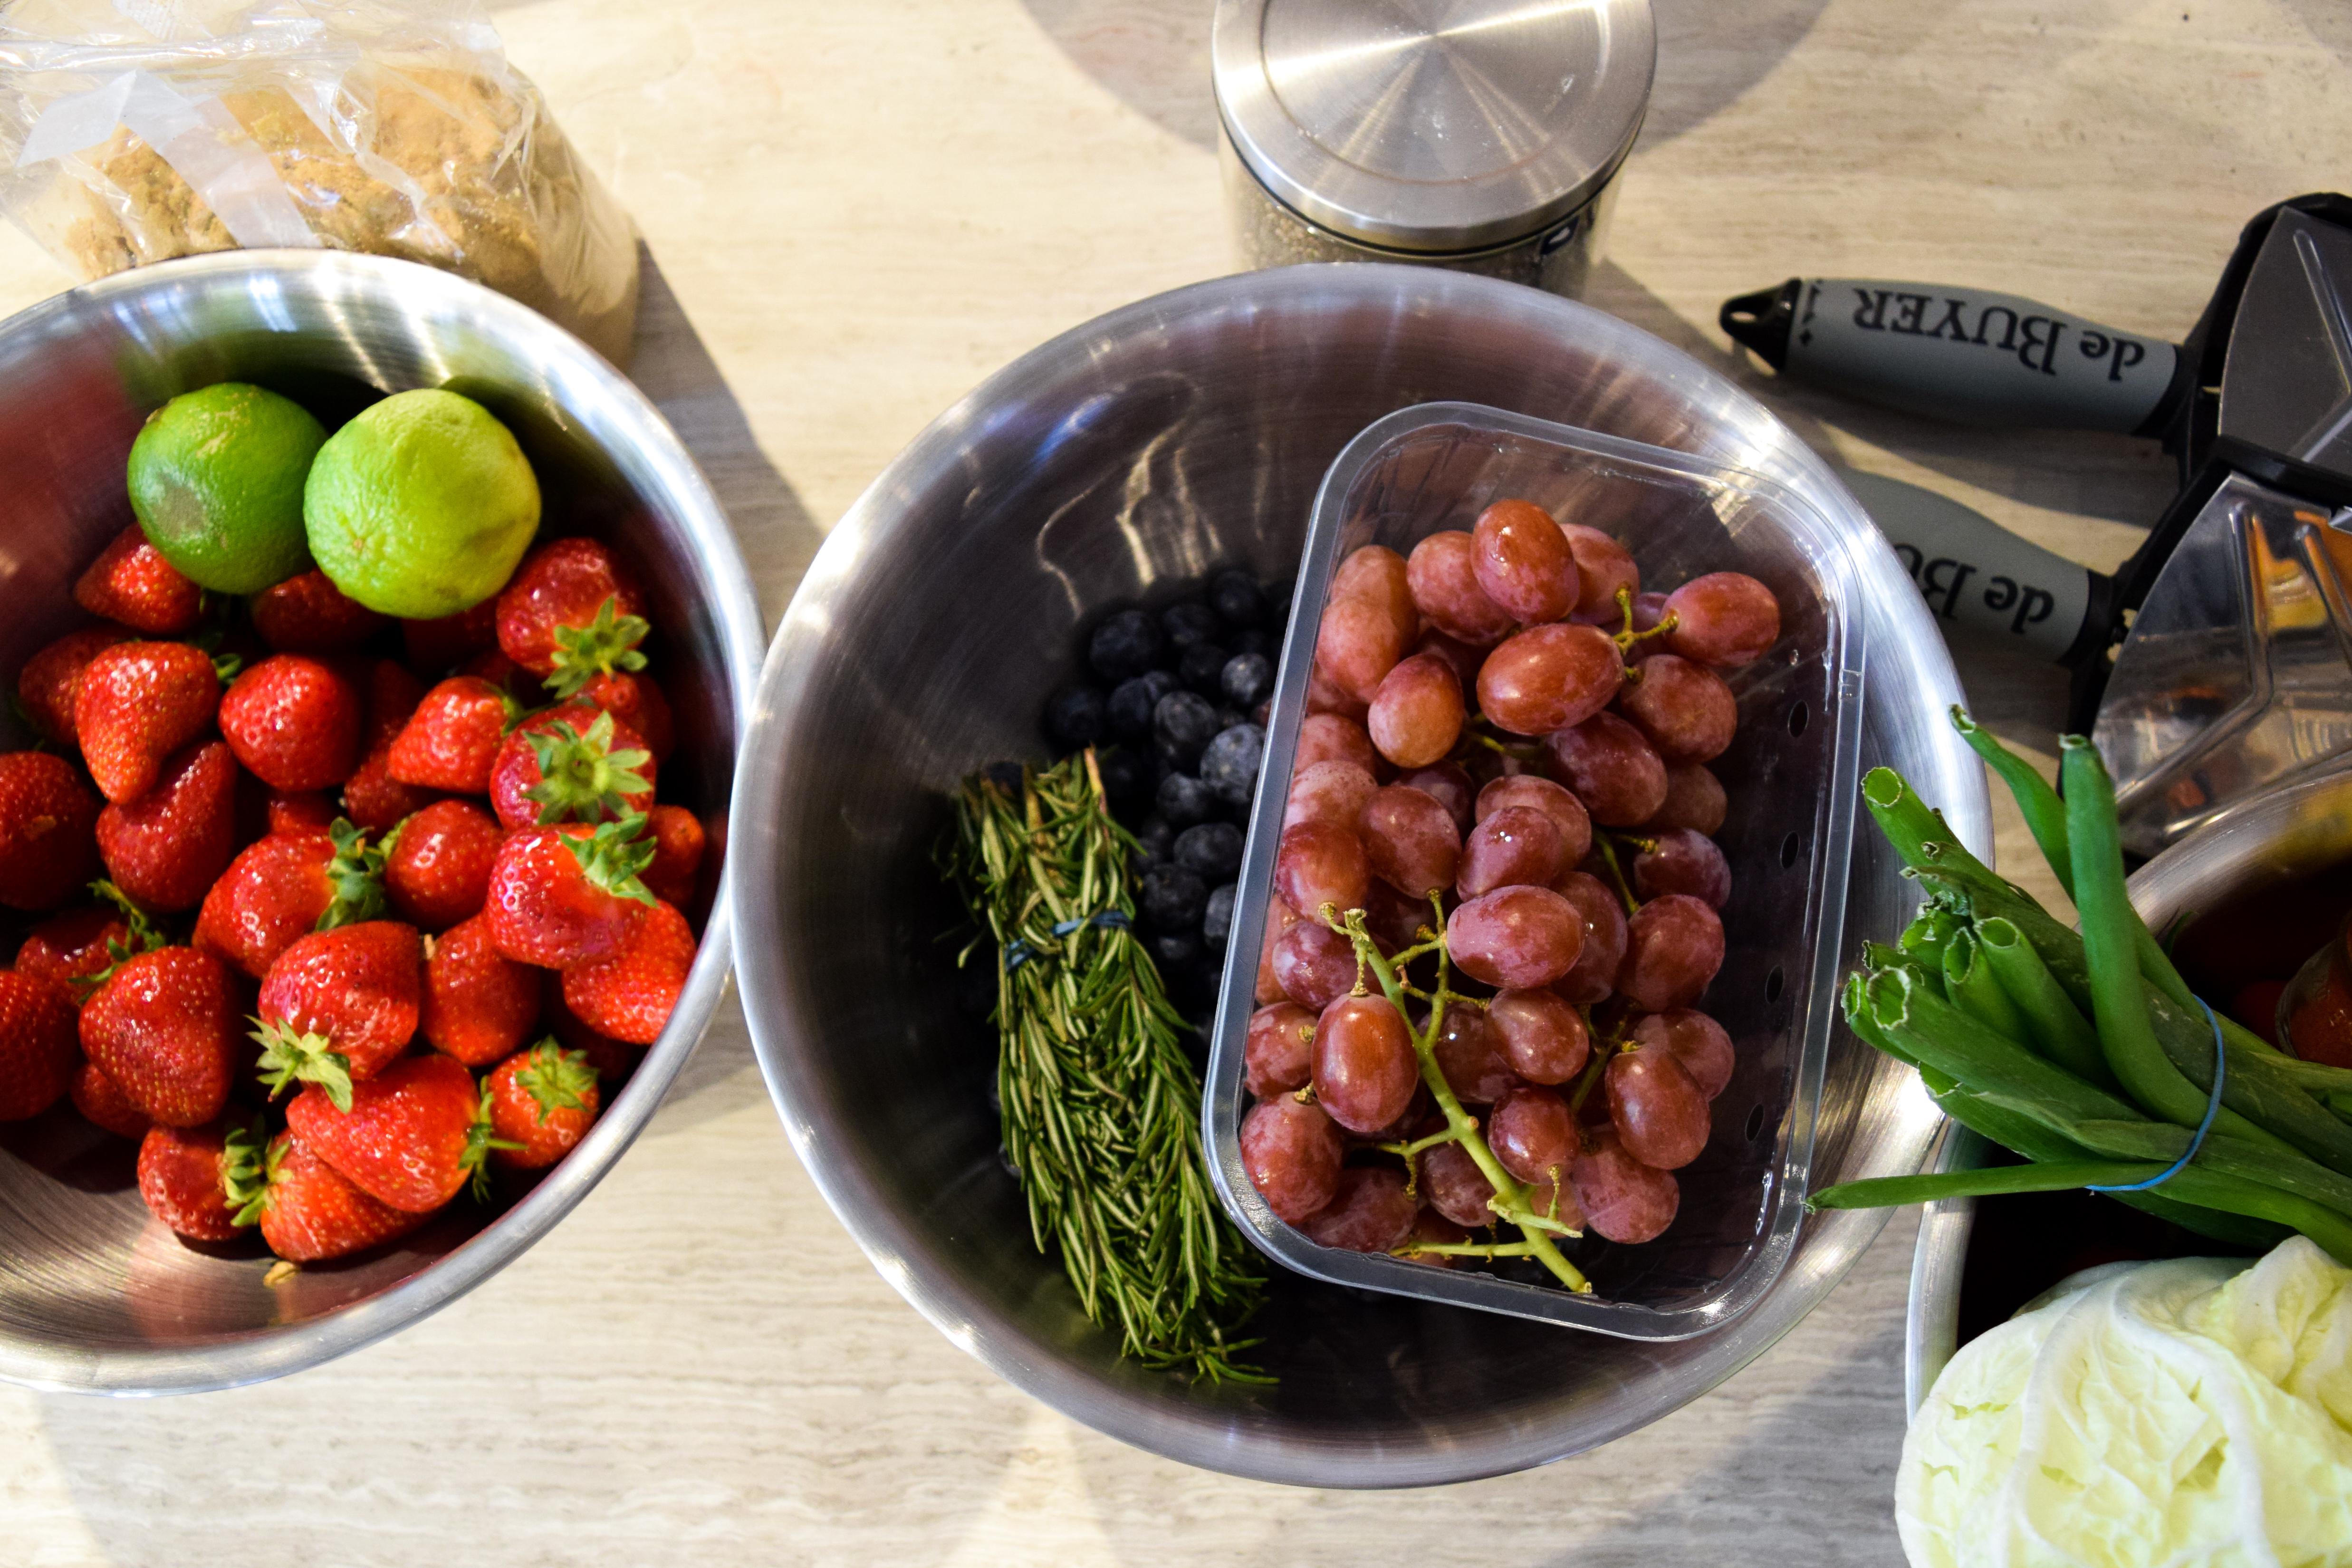 Making Jams at the Jam and Preserves Masterclass at Borough Kitchen